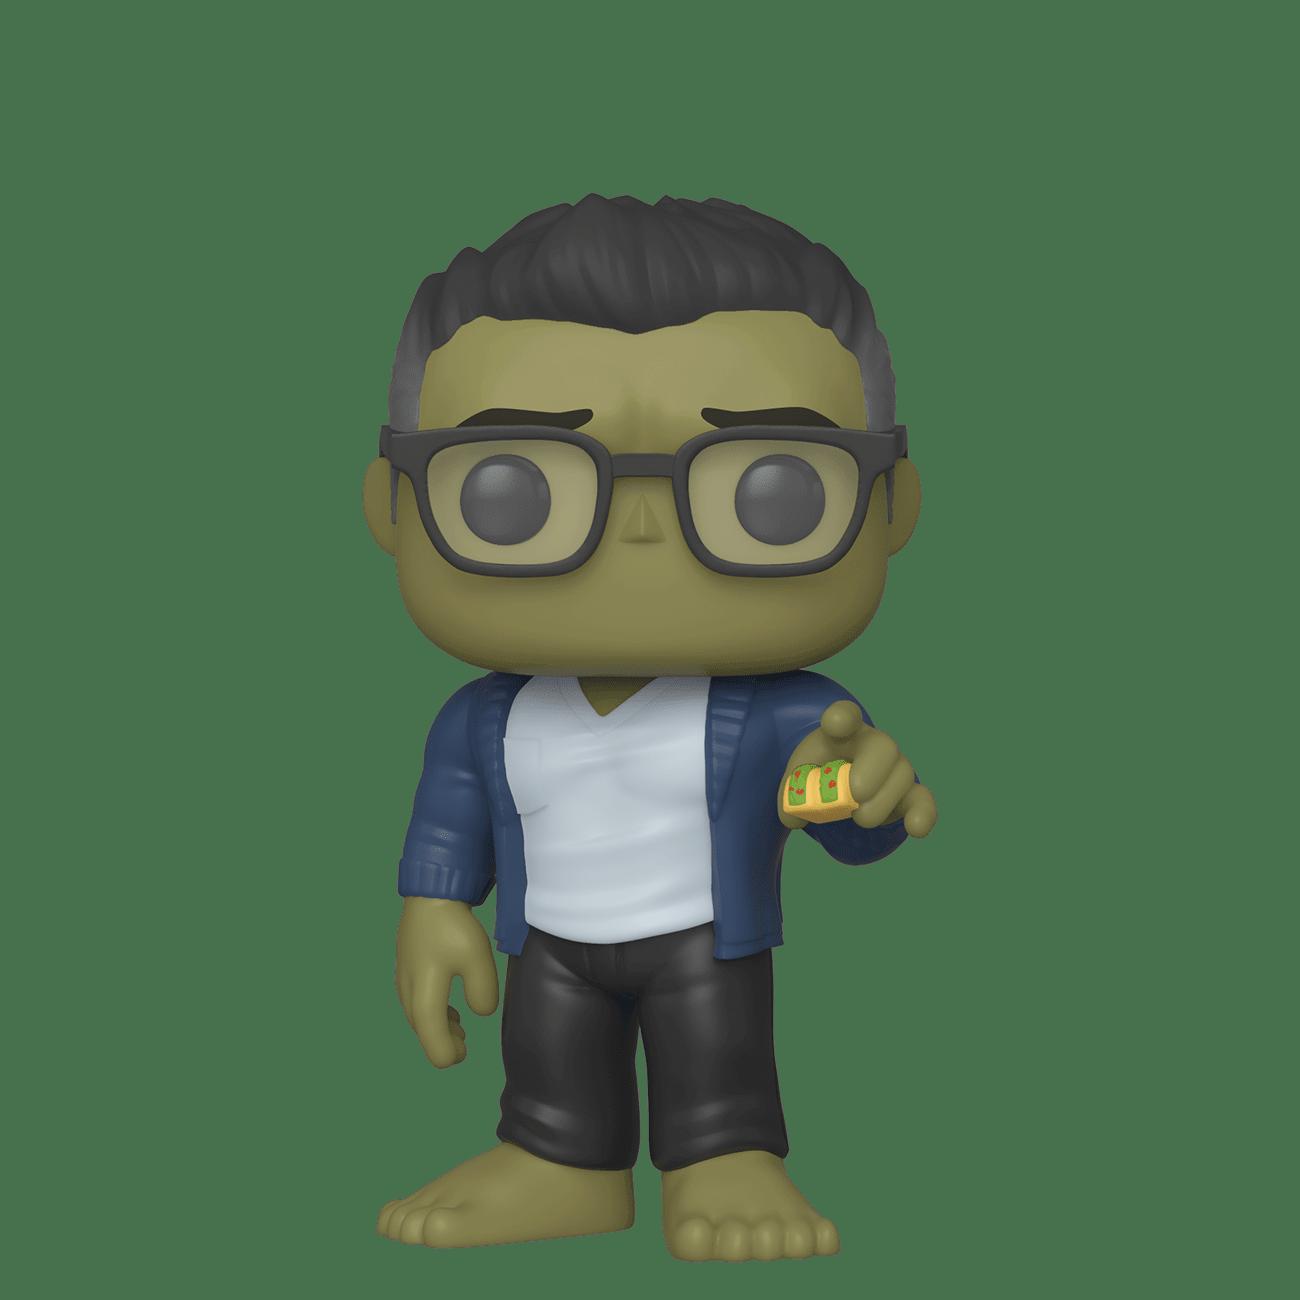 Funko Marvel - Endgame Hulk with Taco Funko Pop! Figure